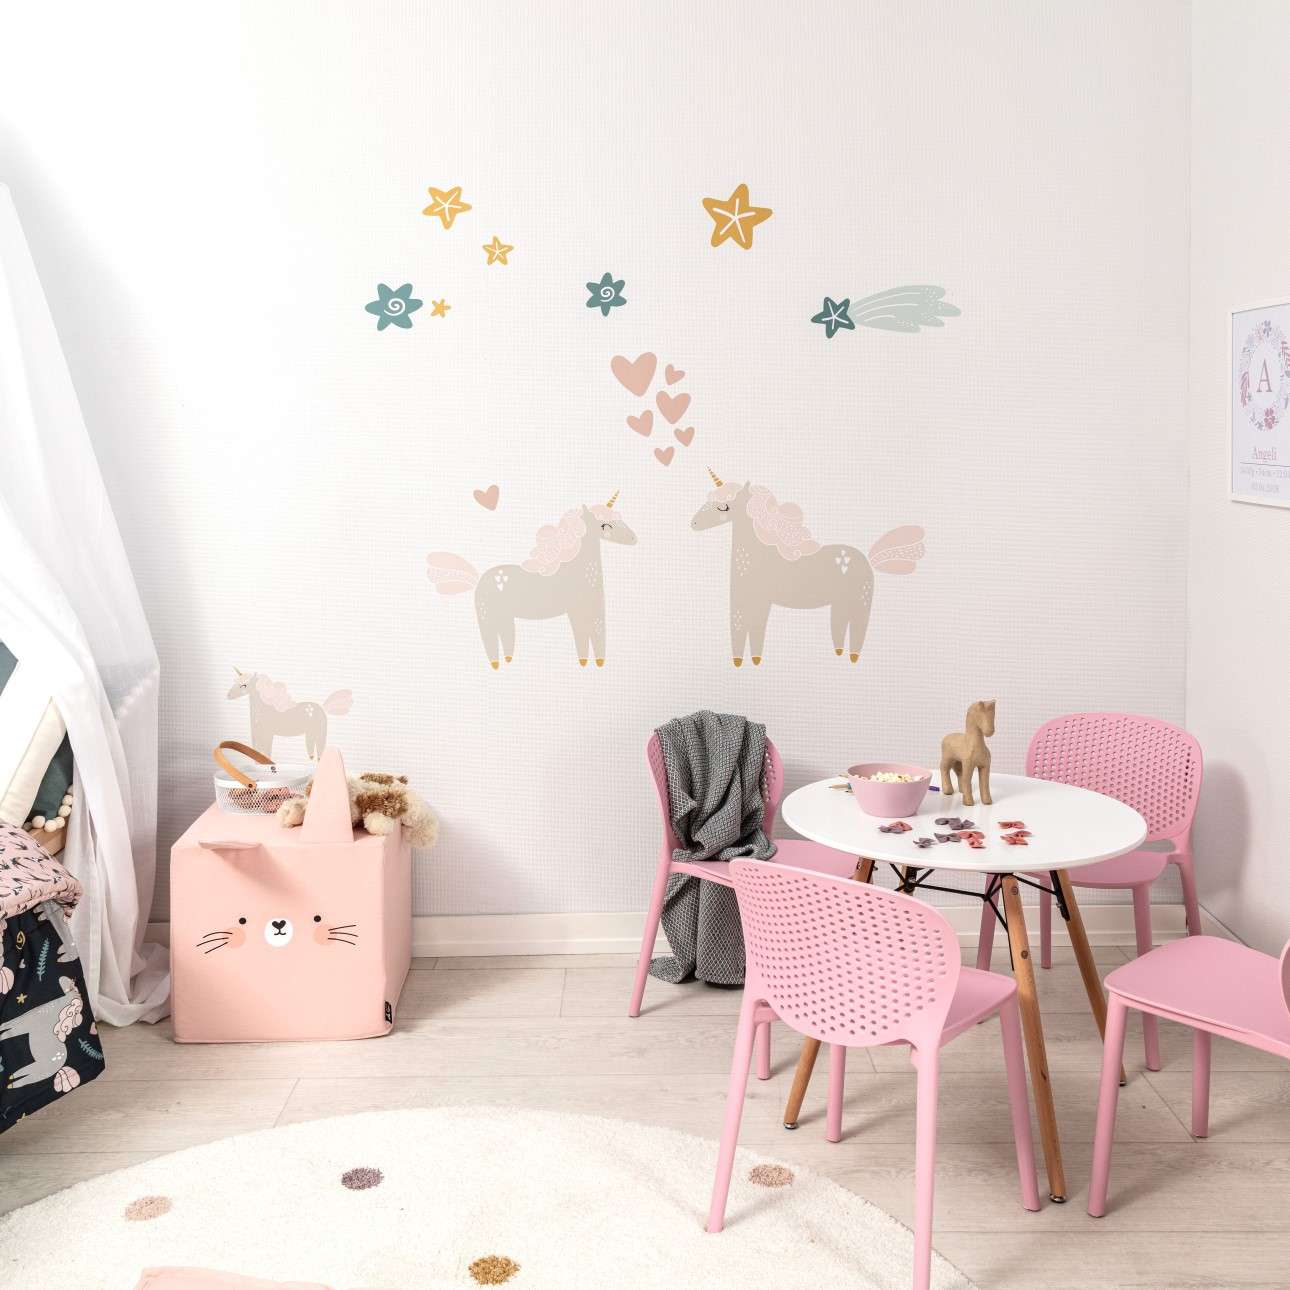 Lovely Unicorn sticker set